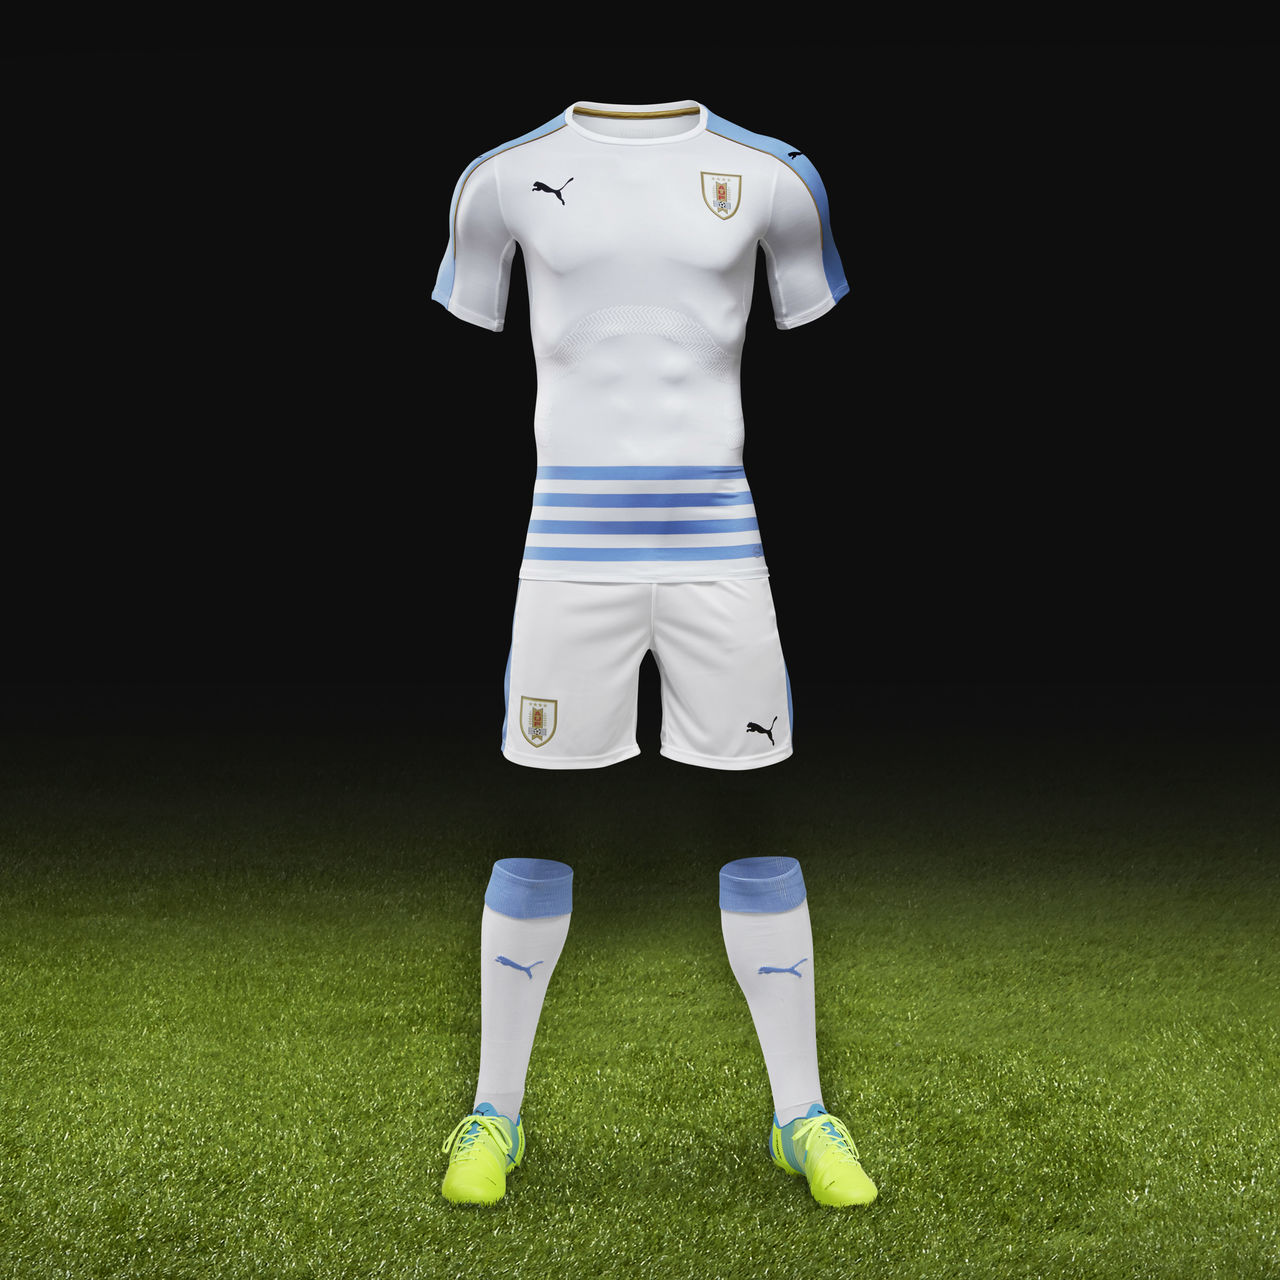 9a3977e0f0c Uruguay 2016 Copa America Puma Away Shirt | 16/17 Kits | Football ...